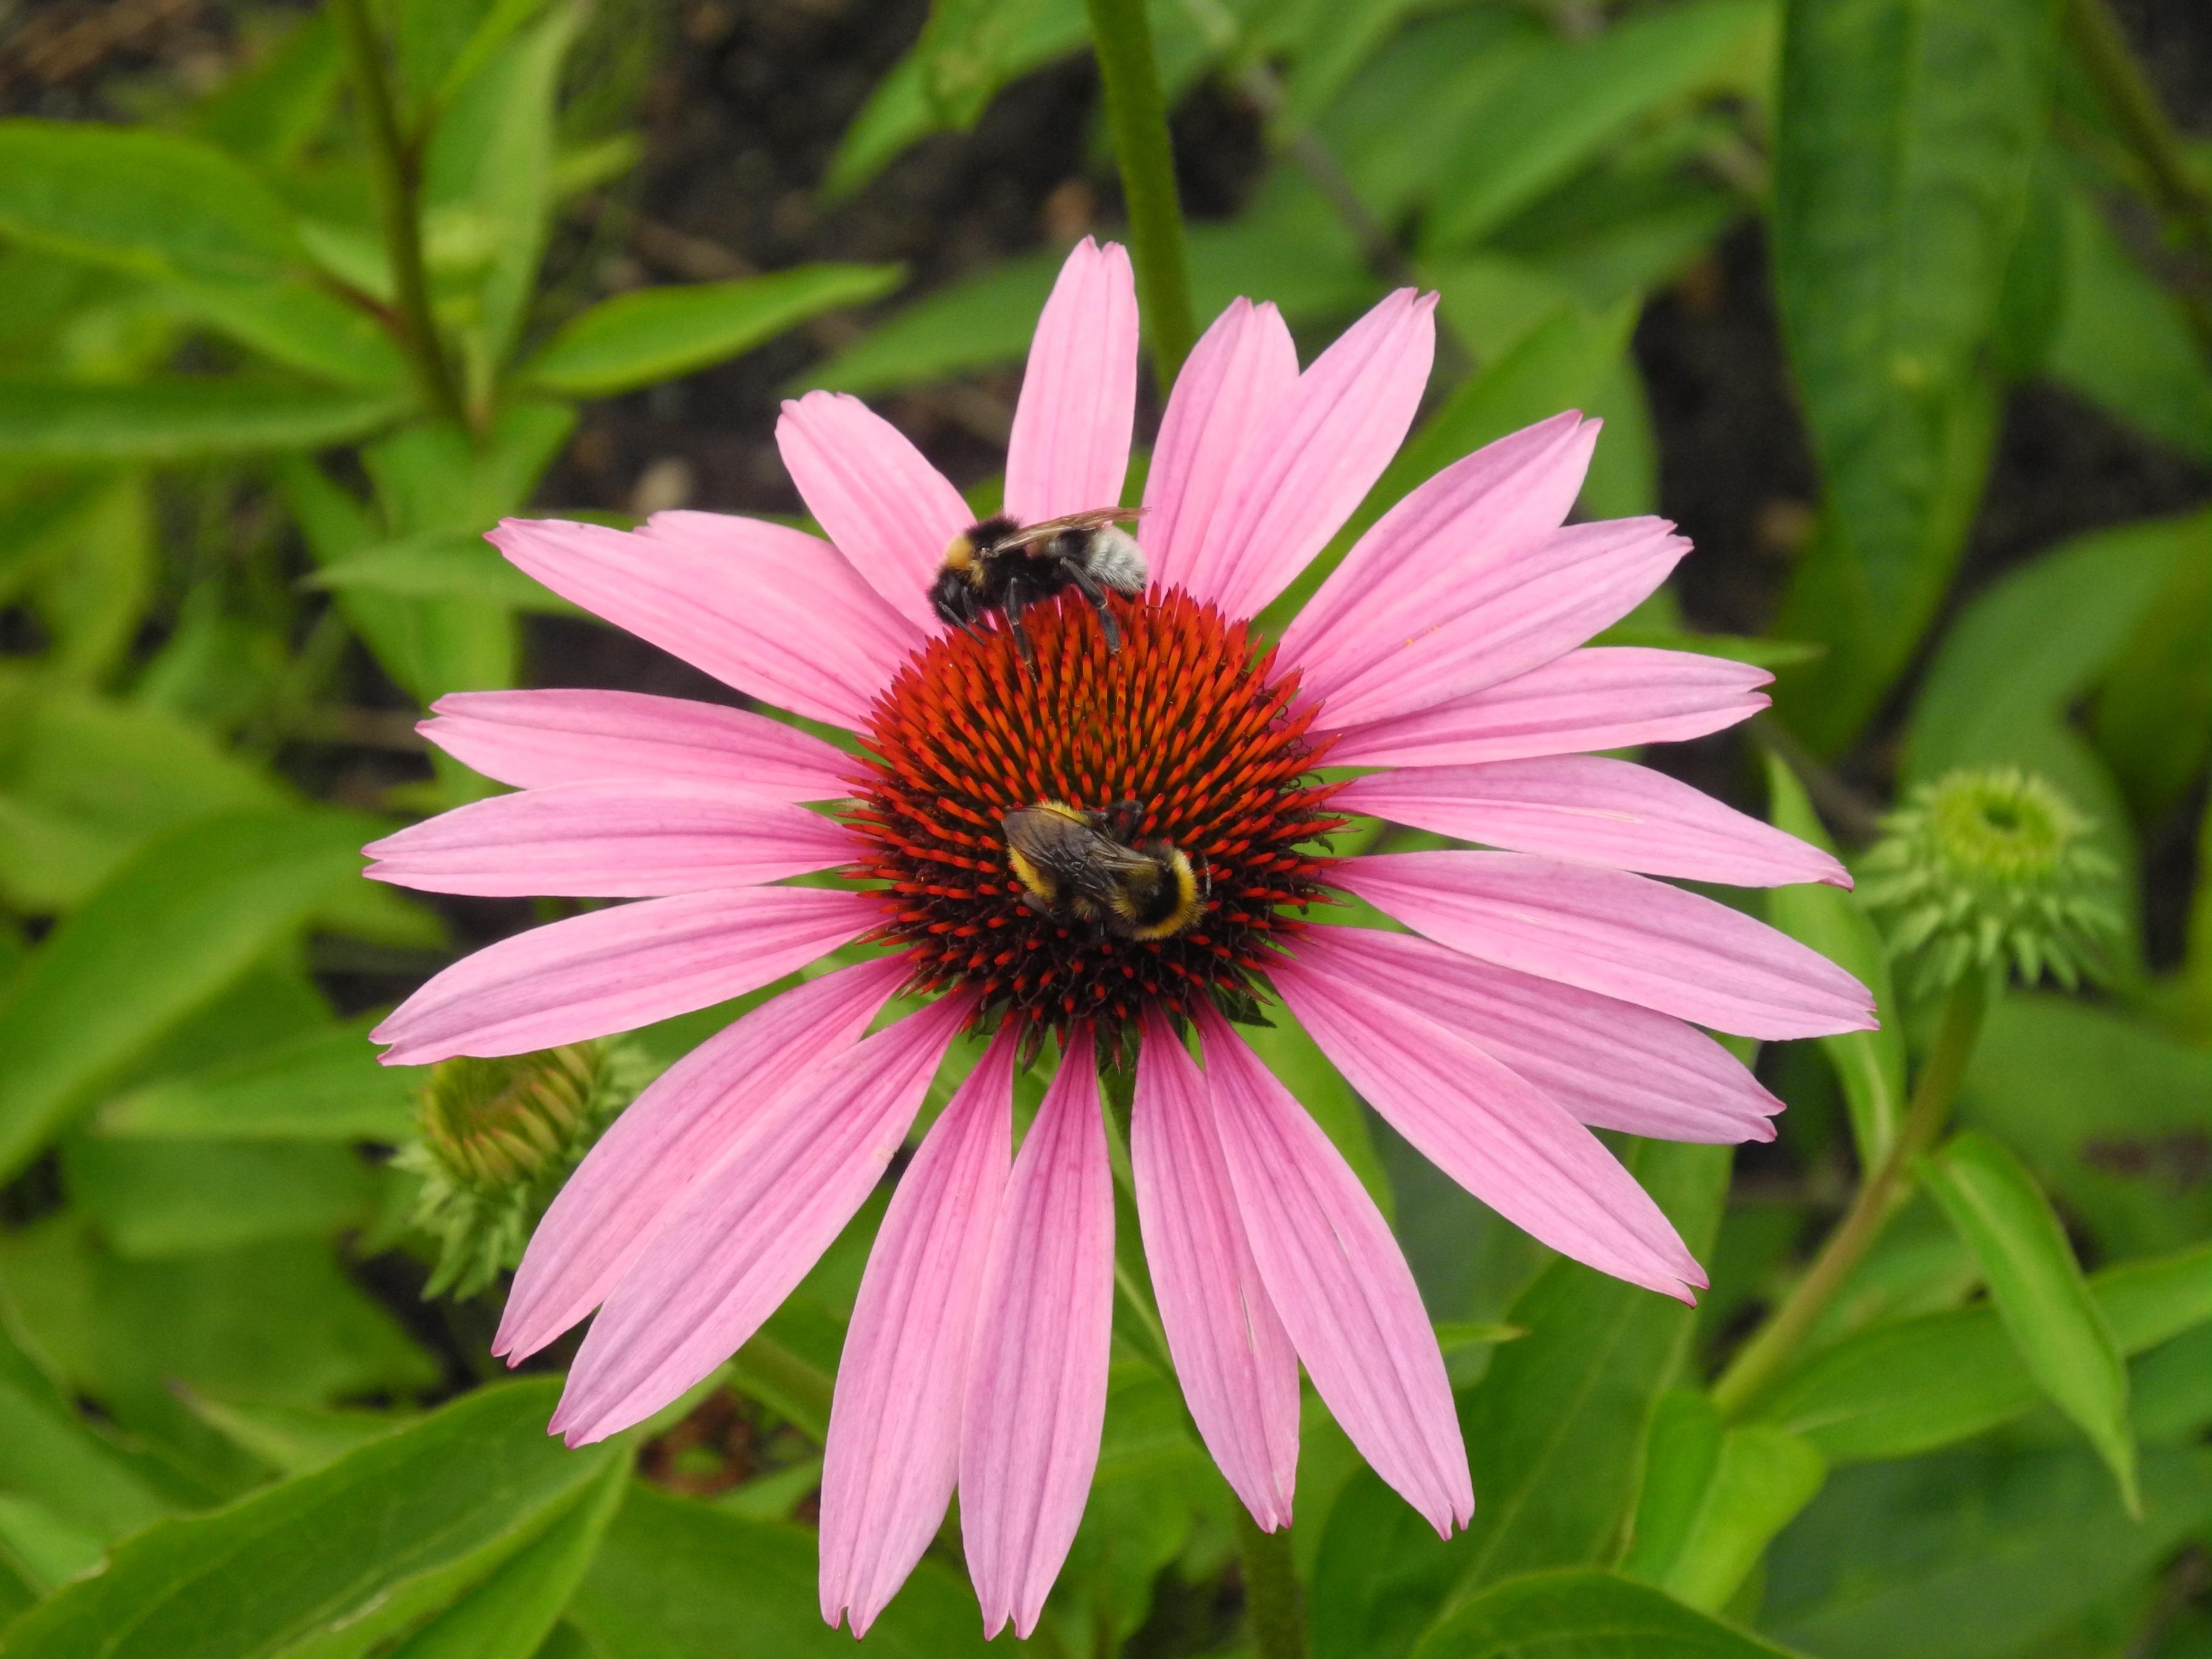 kostenlose foto natur bl hen blume bl tenblatt g nsebl mchen pollen best ubung insekt. Black Bedroom Furniture Sets. Home Design Ideas